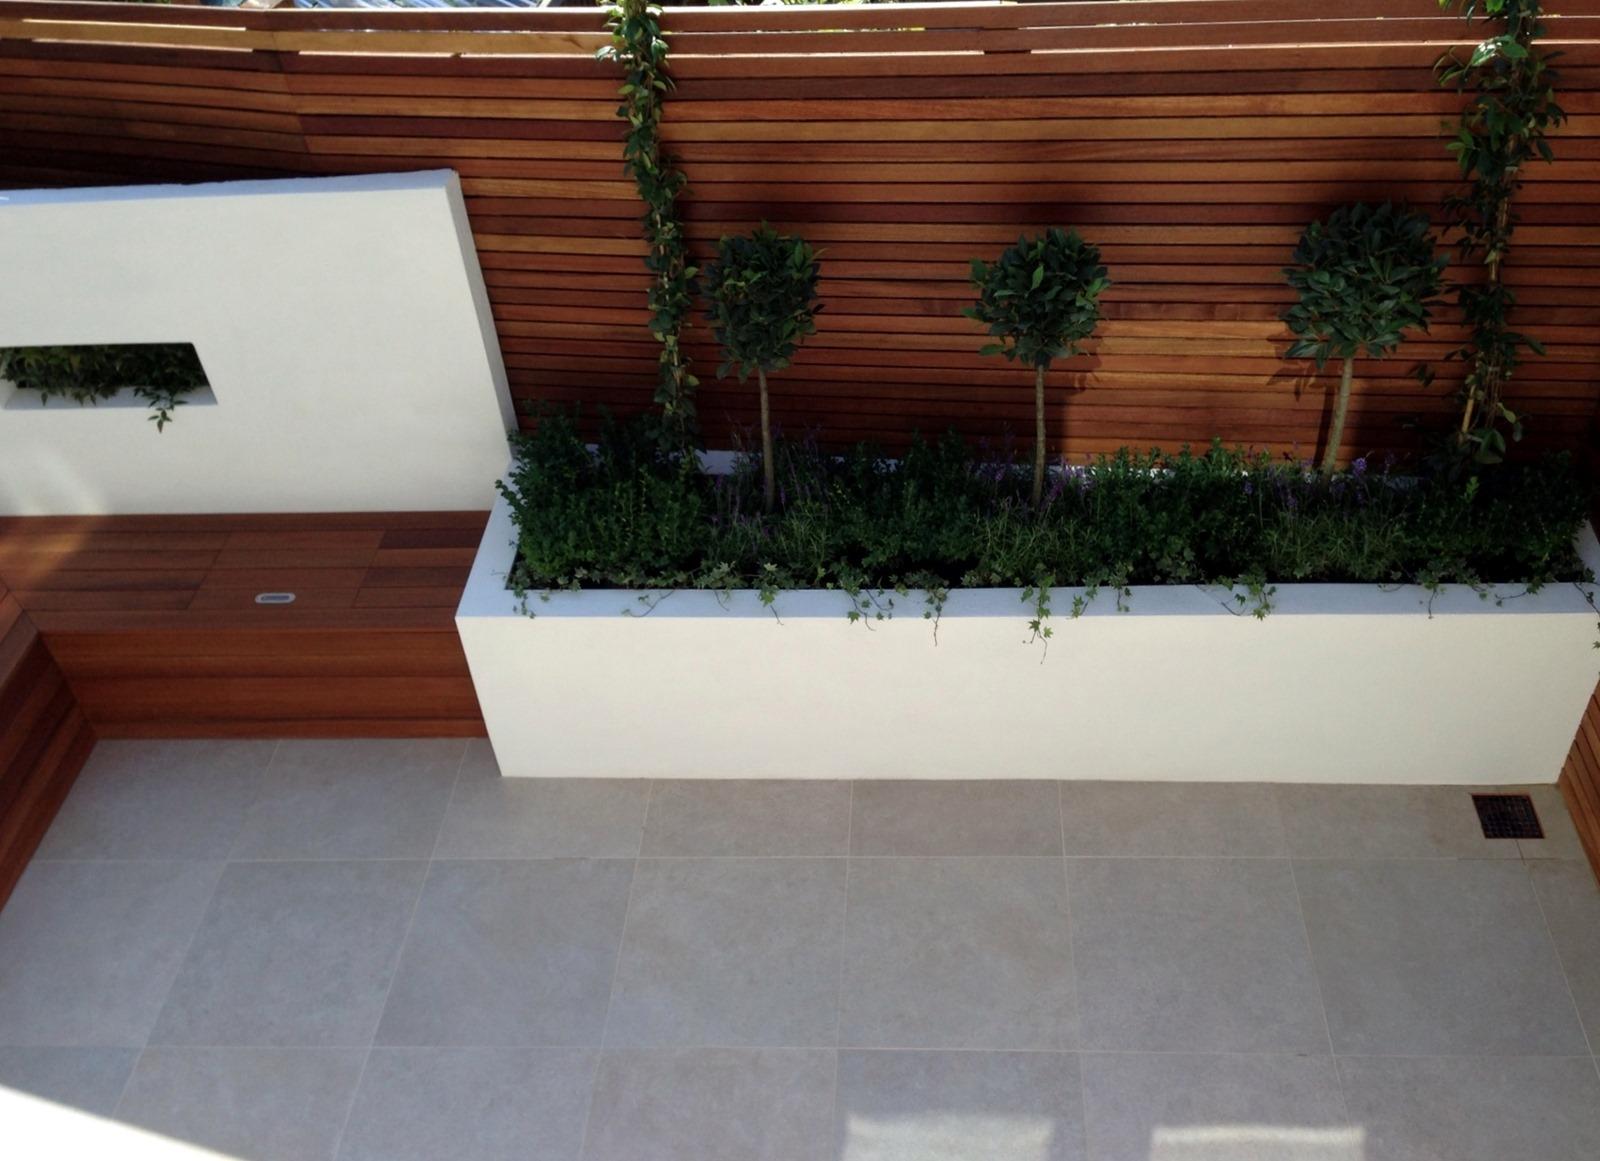 Small Garden Design London Clapham Balham Ideas Low Maintenance Grey Tiles London Garden Design